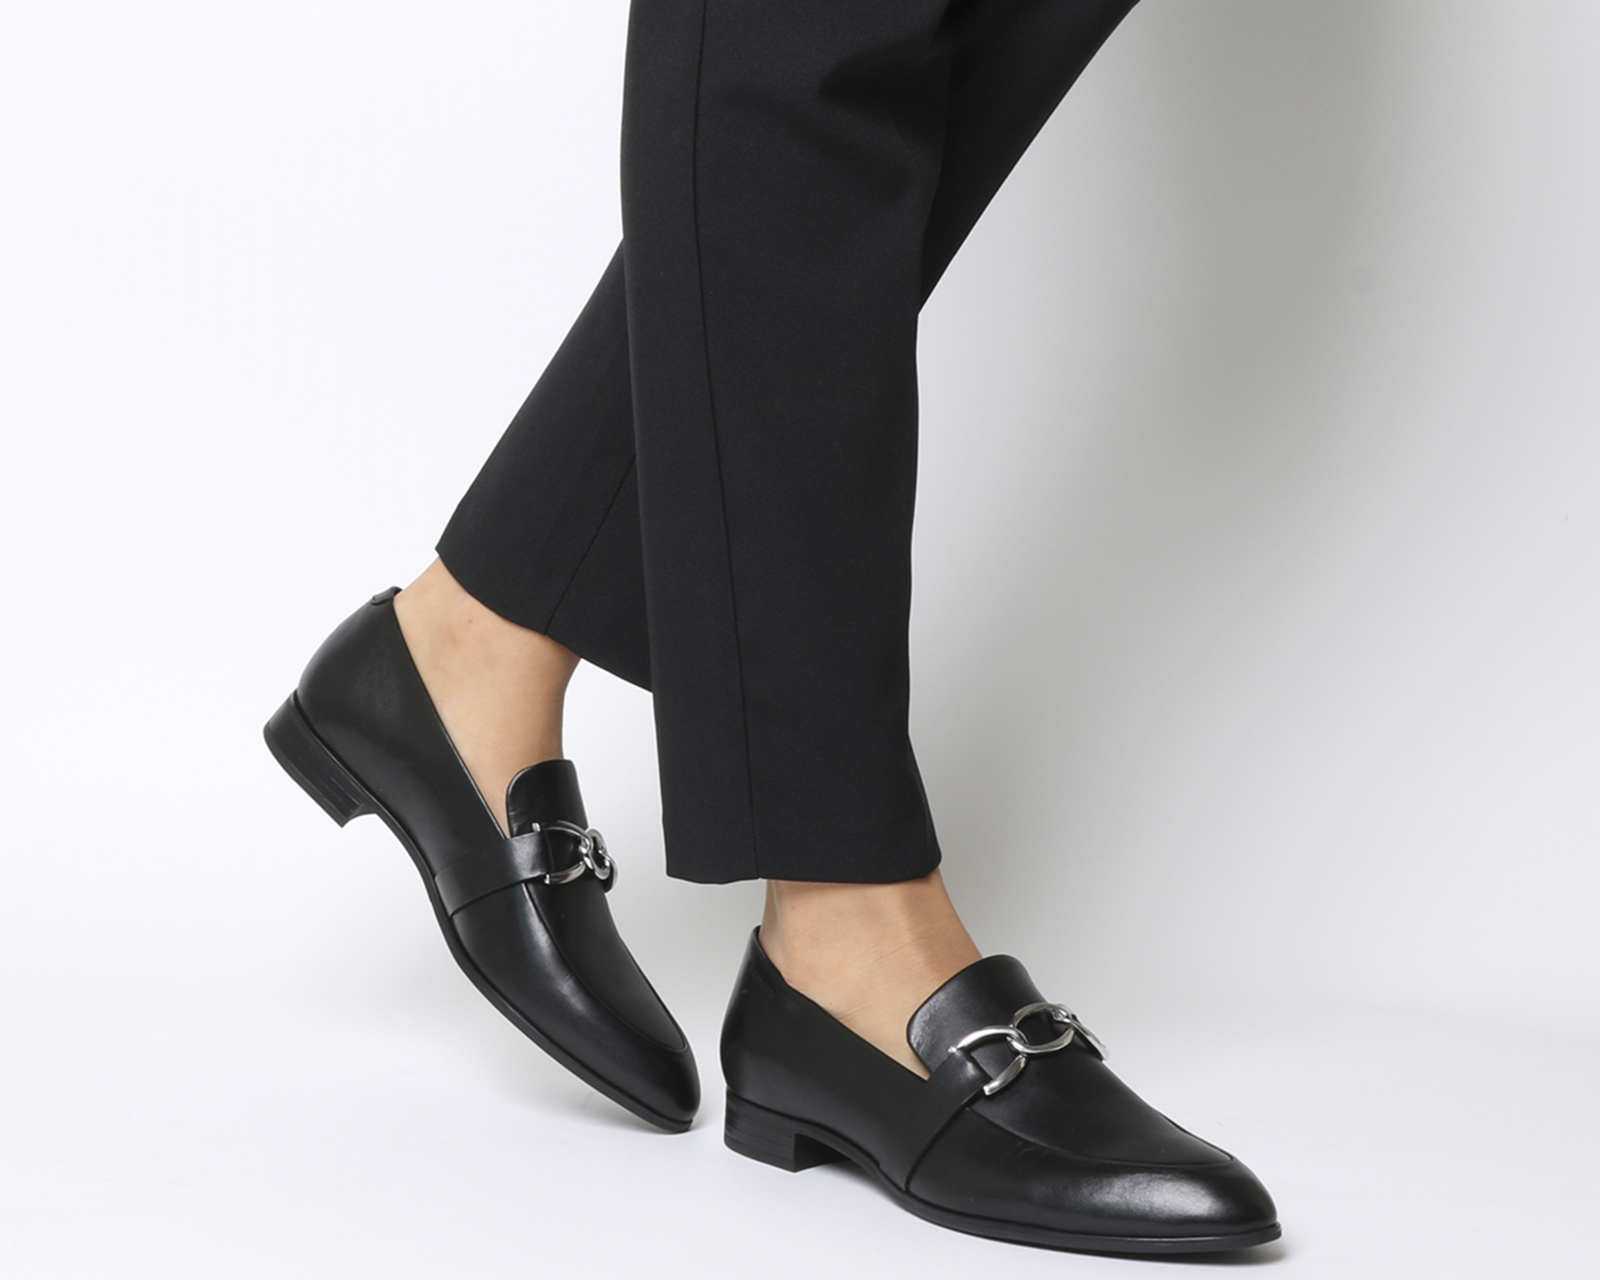 6501b5dae0c Details about Womens Vagabond Frances Detail Loafers Black Leather Flats